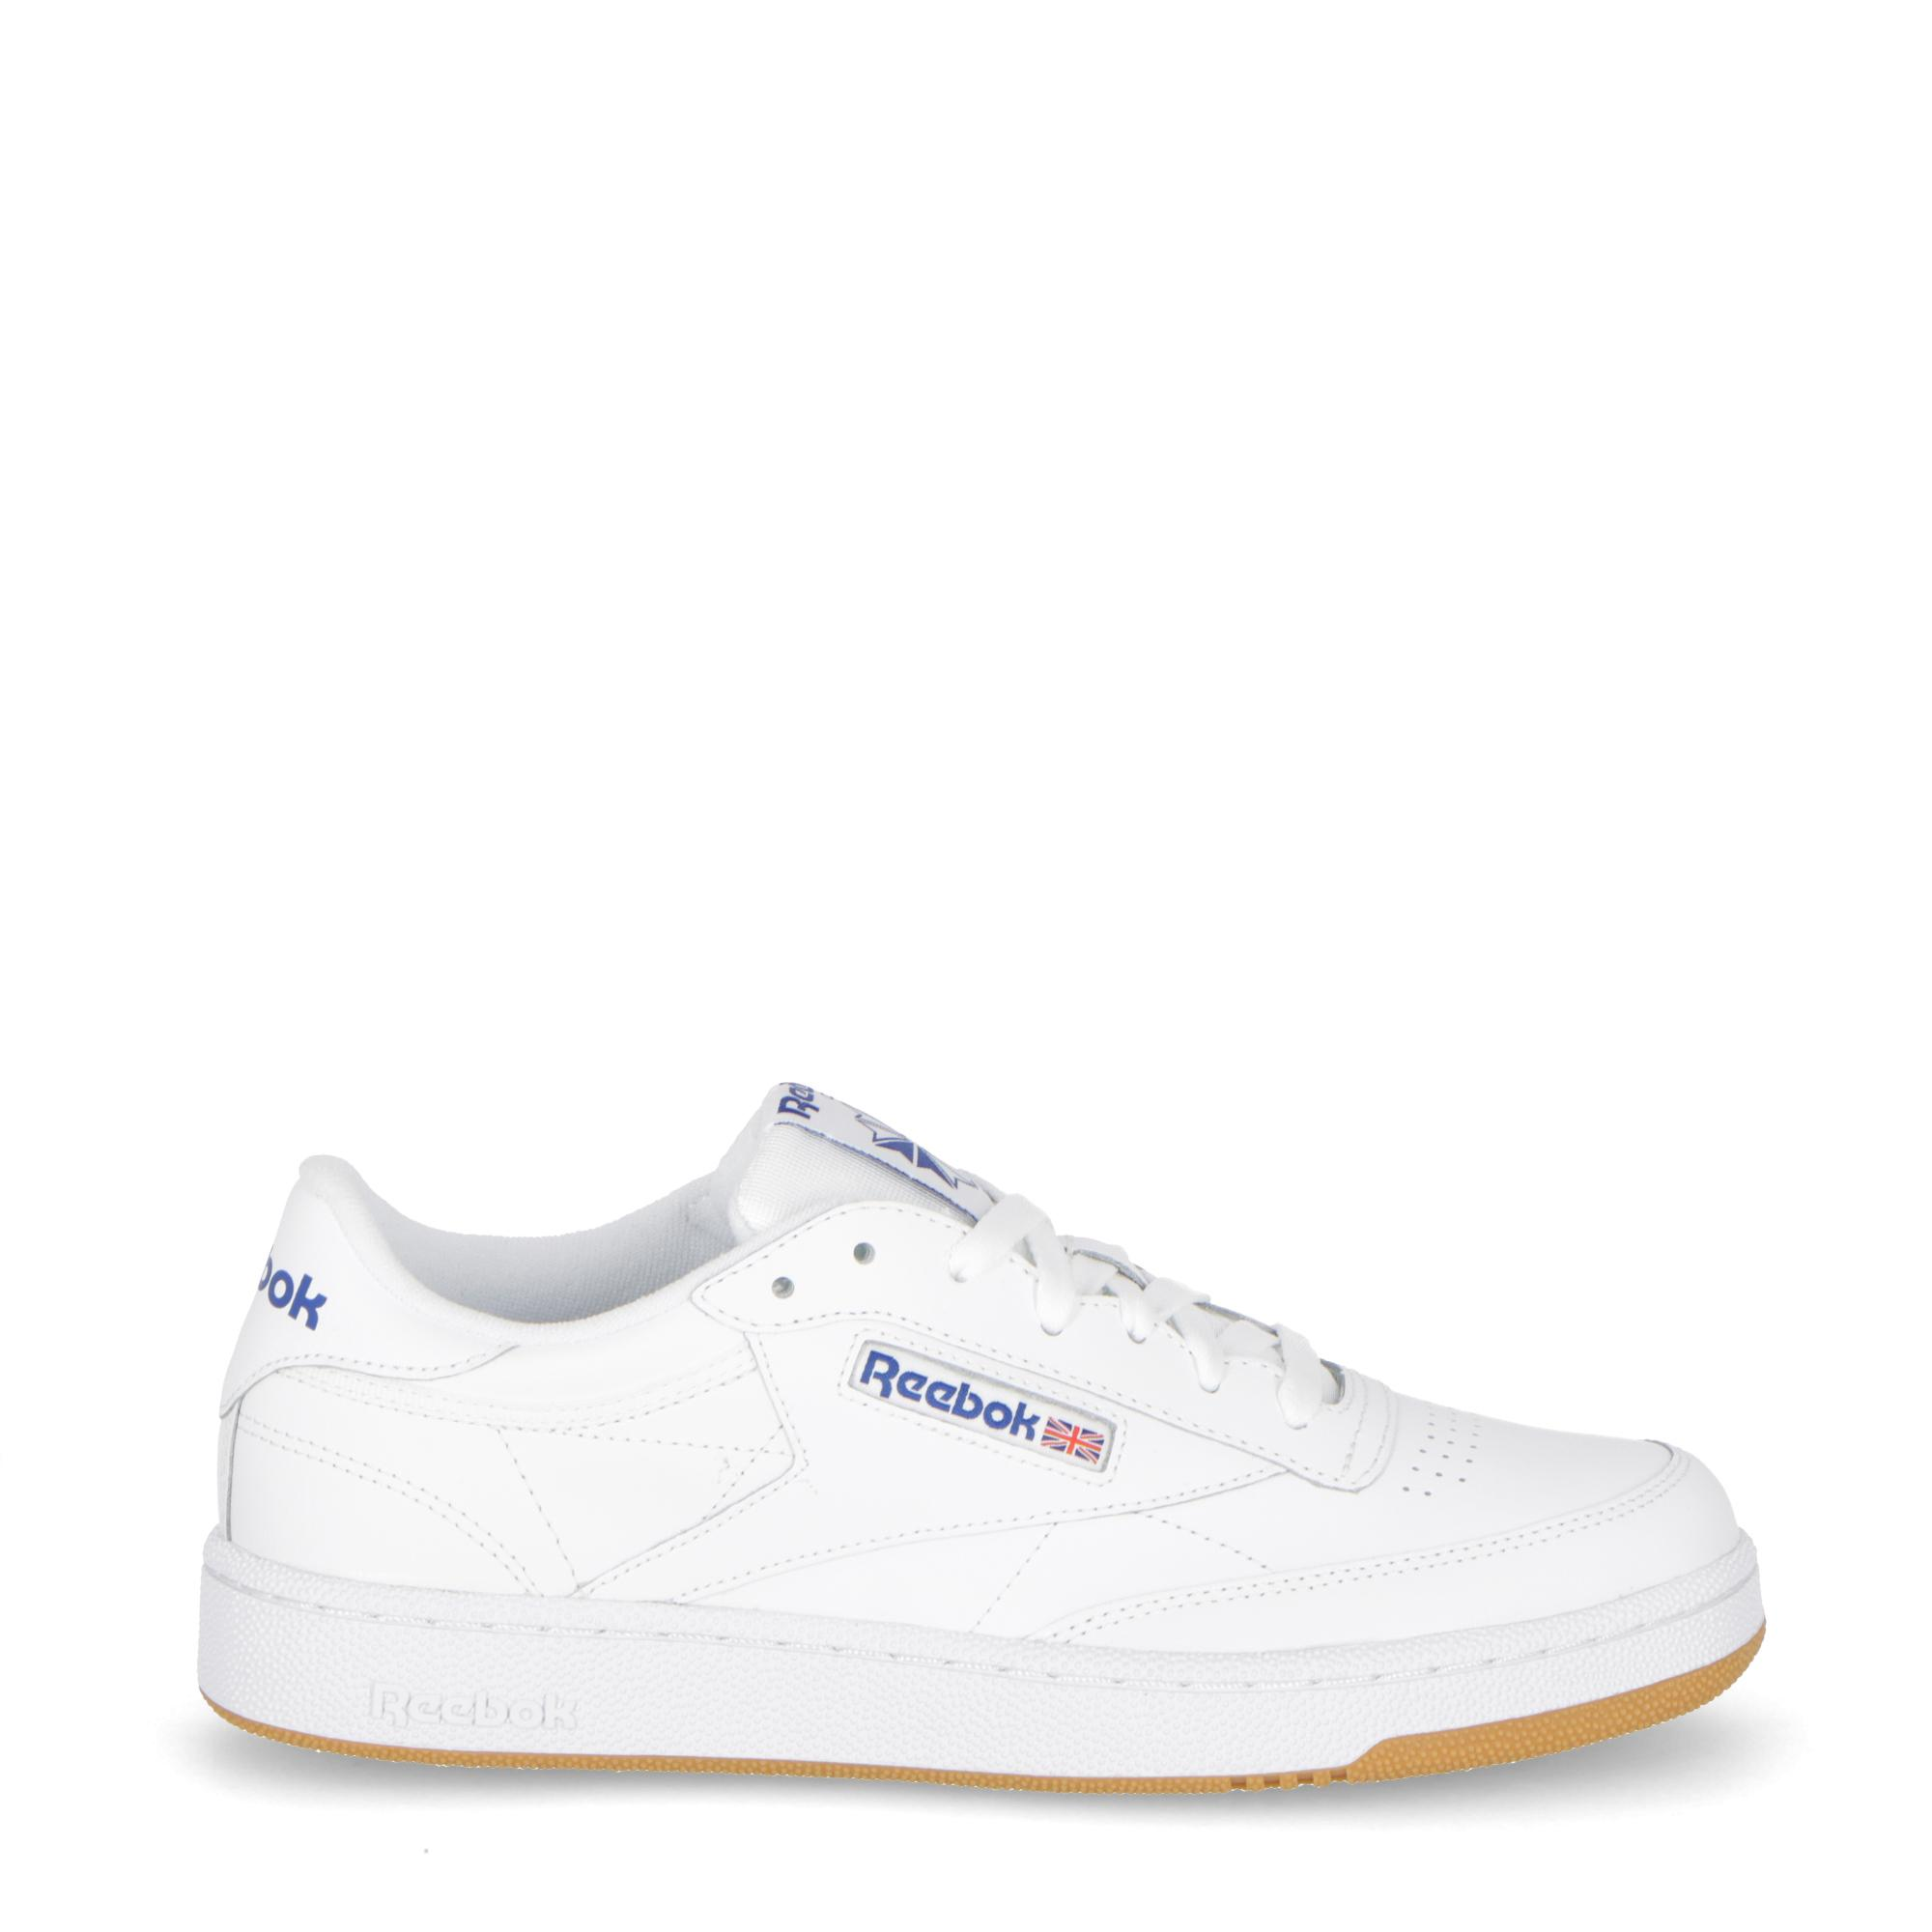 226ea2d8ba948 Reebok Club C 85 Int-white royal-gum